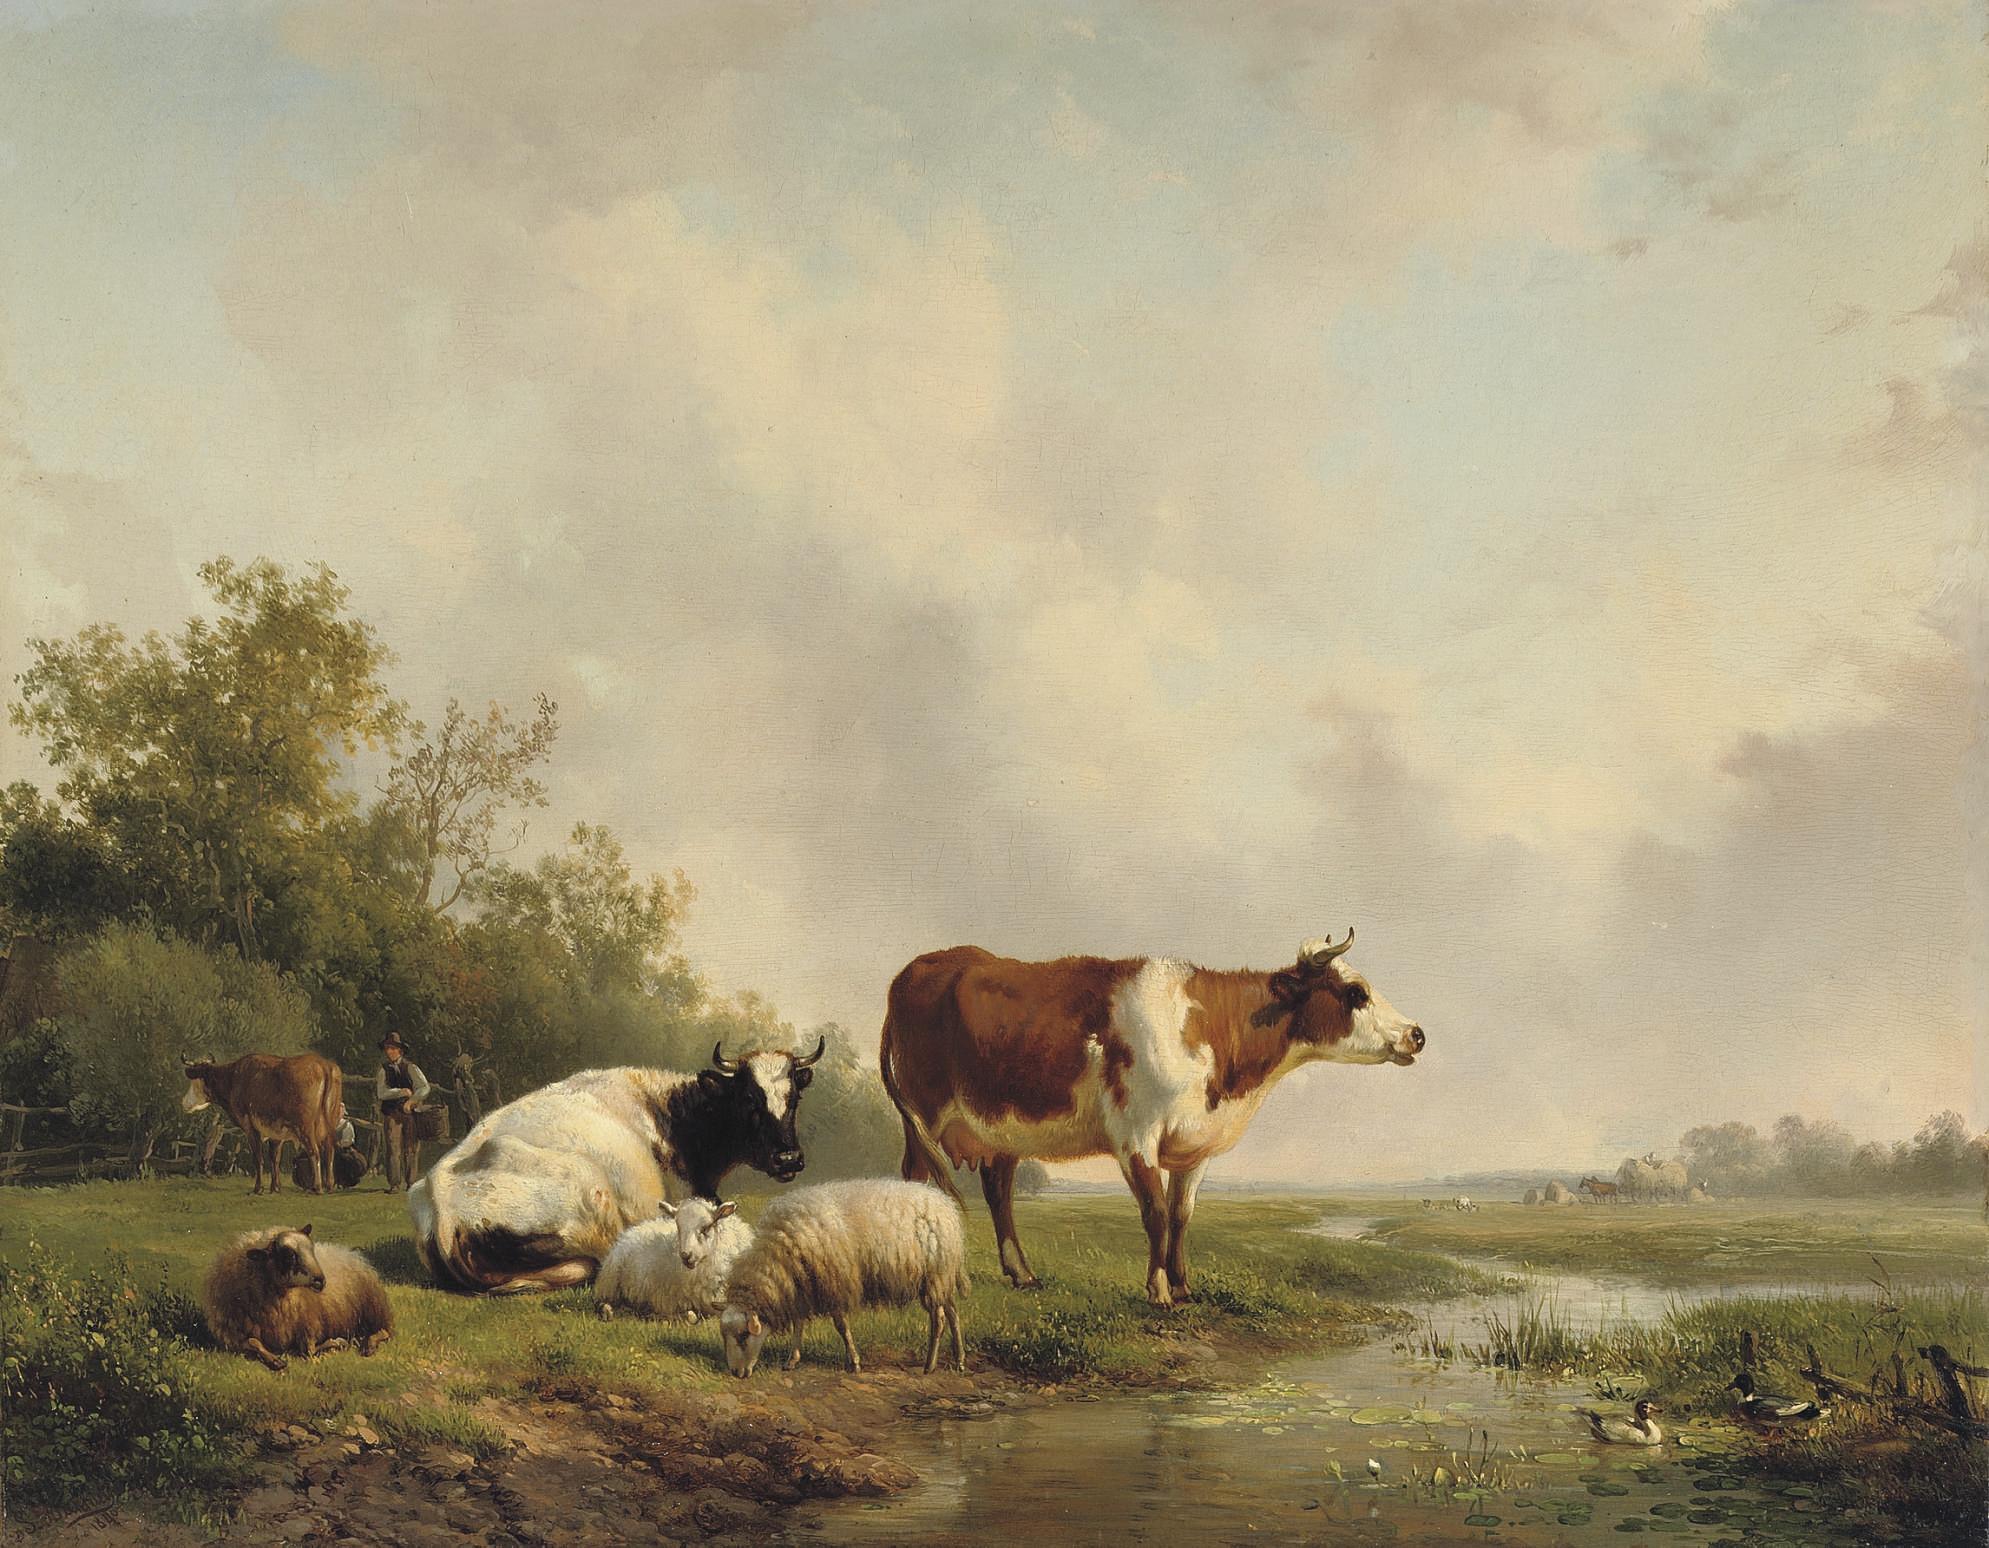 Resting cattle in a meadow